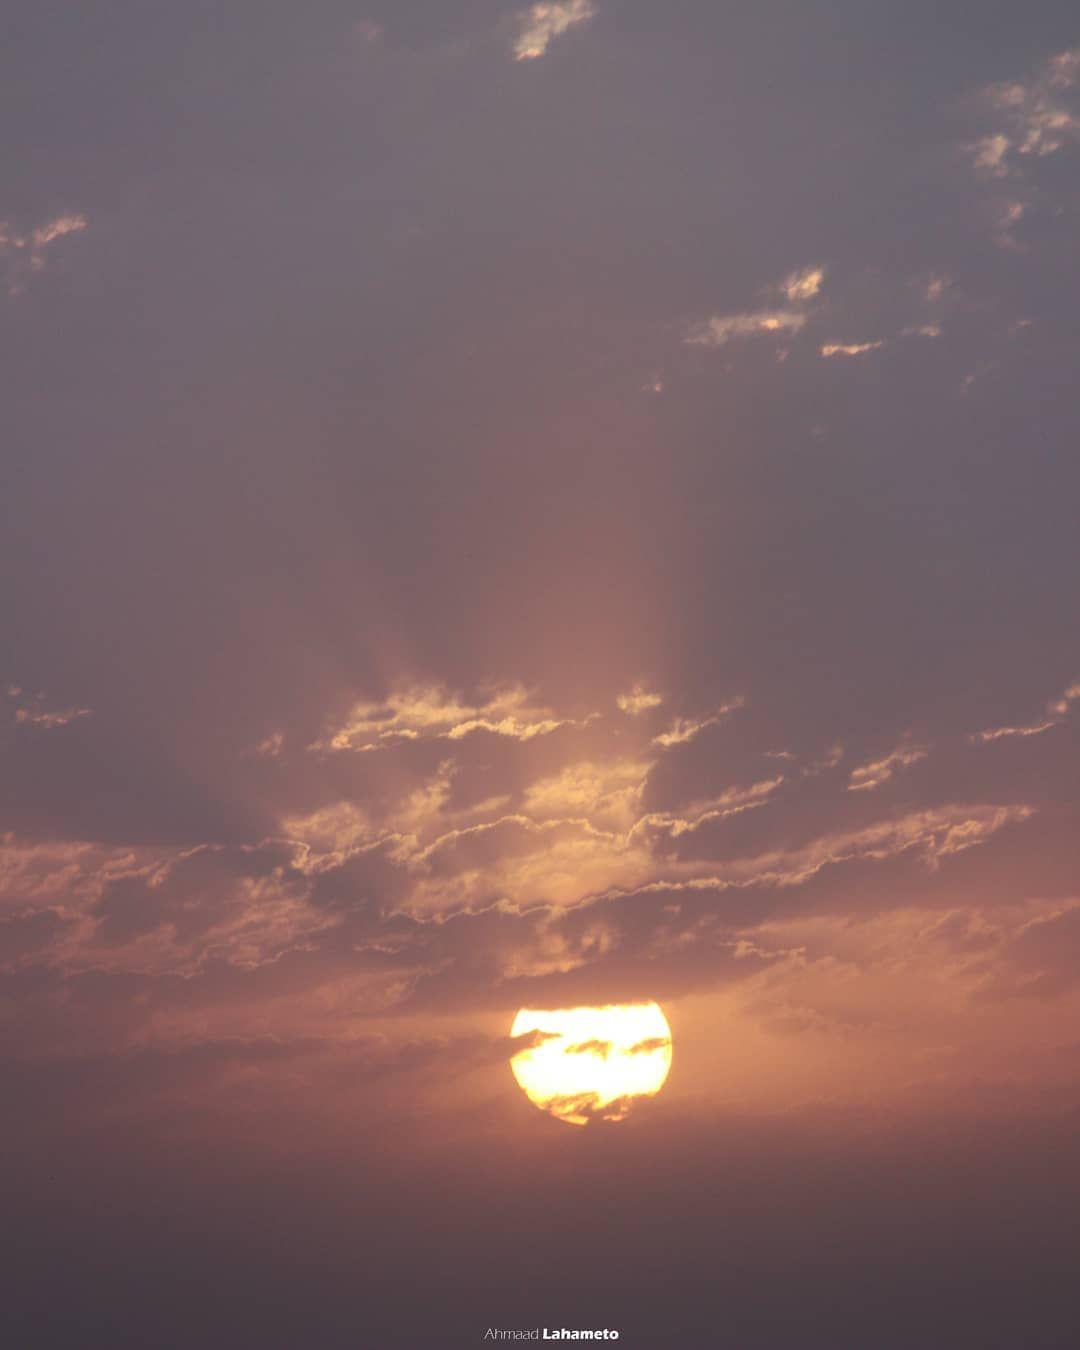 صورة من شروق شمس اليوم ٠ ٠ ٠ Instagood Instagram Sunrise Sun Ramadan Nice Photography Filmphotography Picoftheday Pi Pictures Celestial Clouds